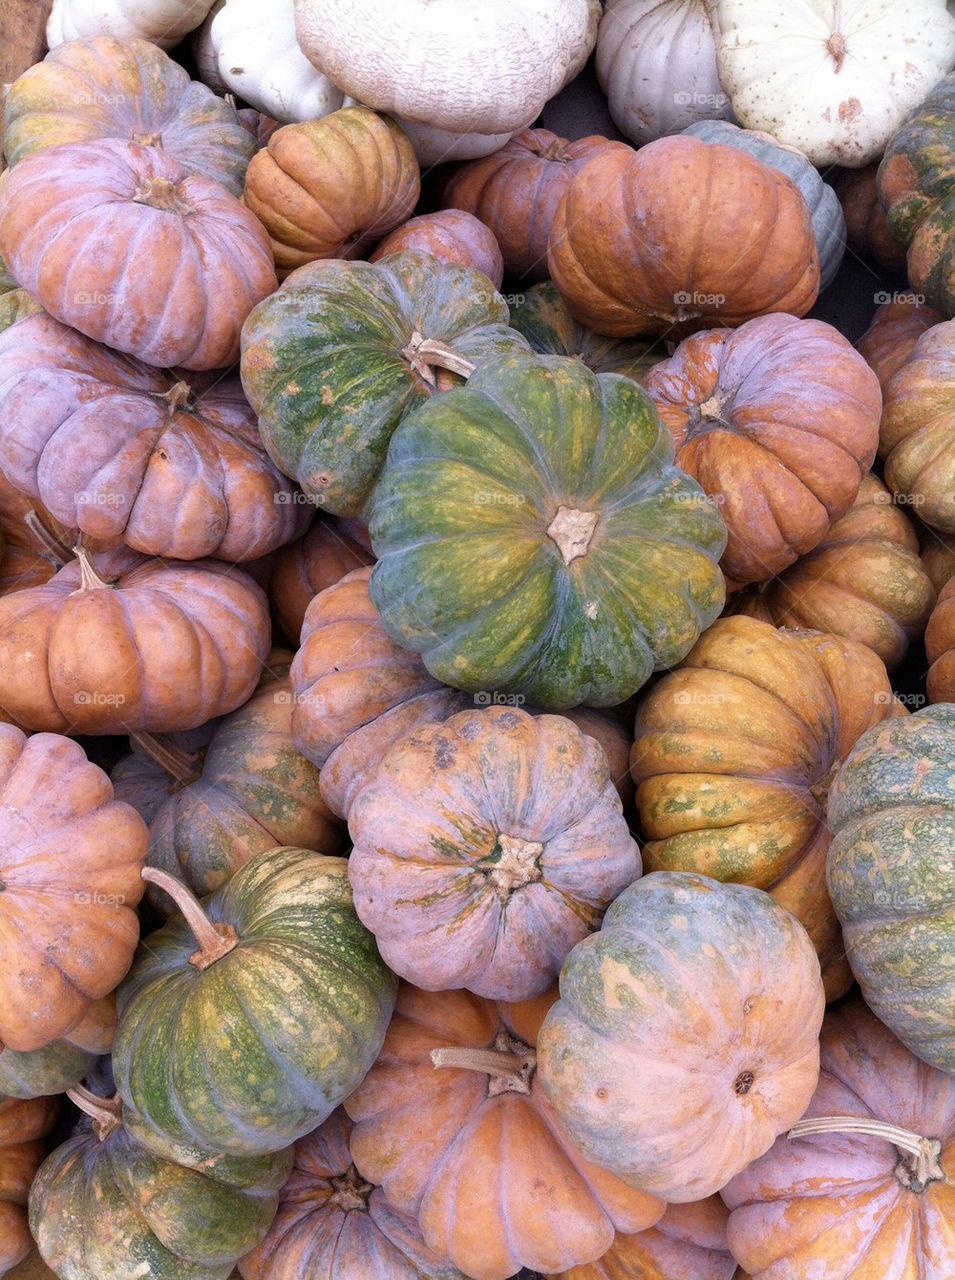 A variety of pumpkins during autumn.